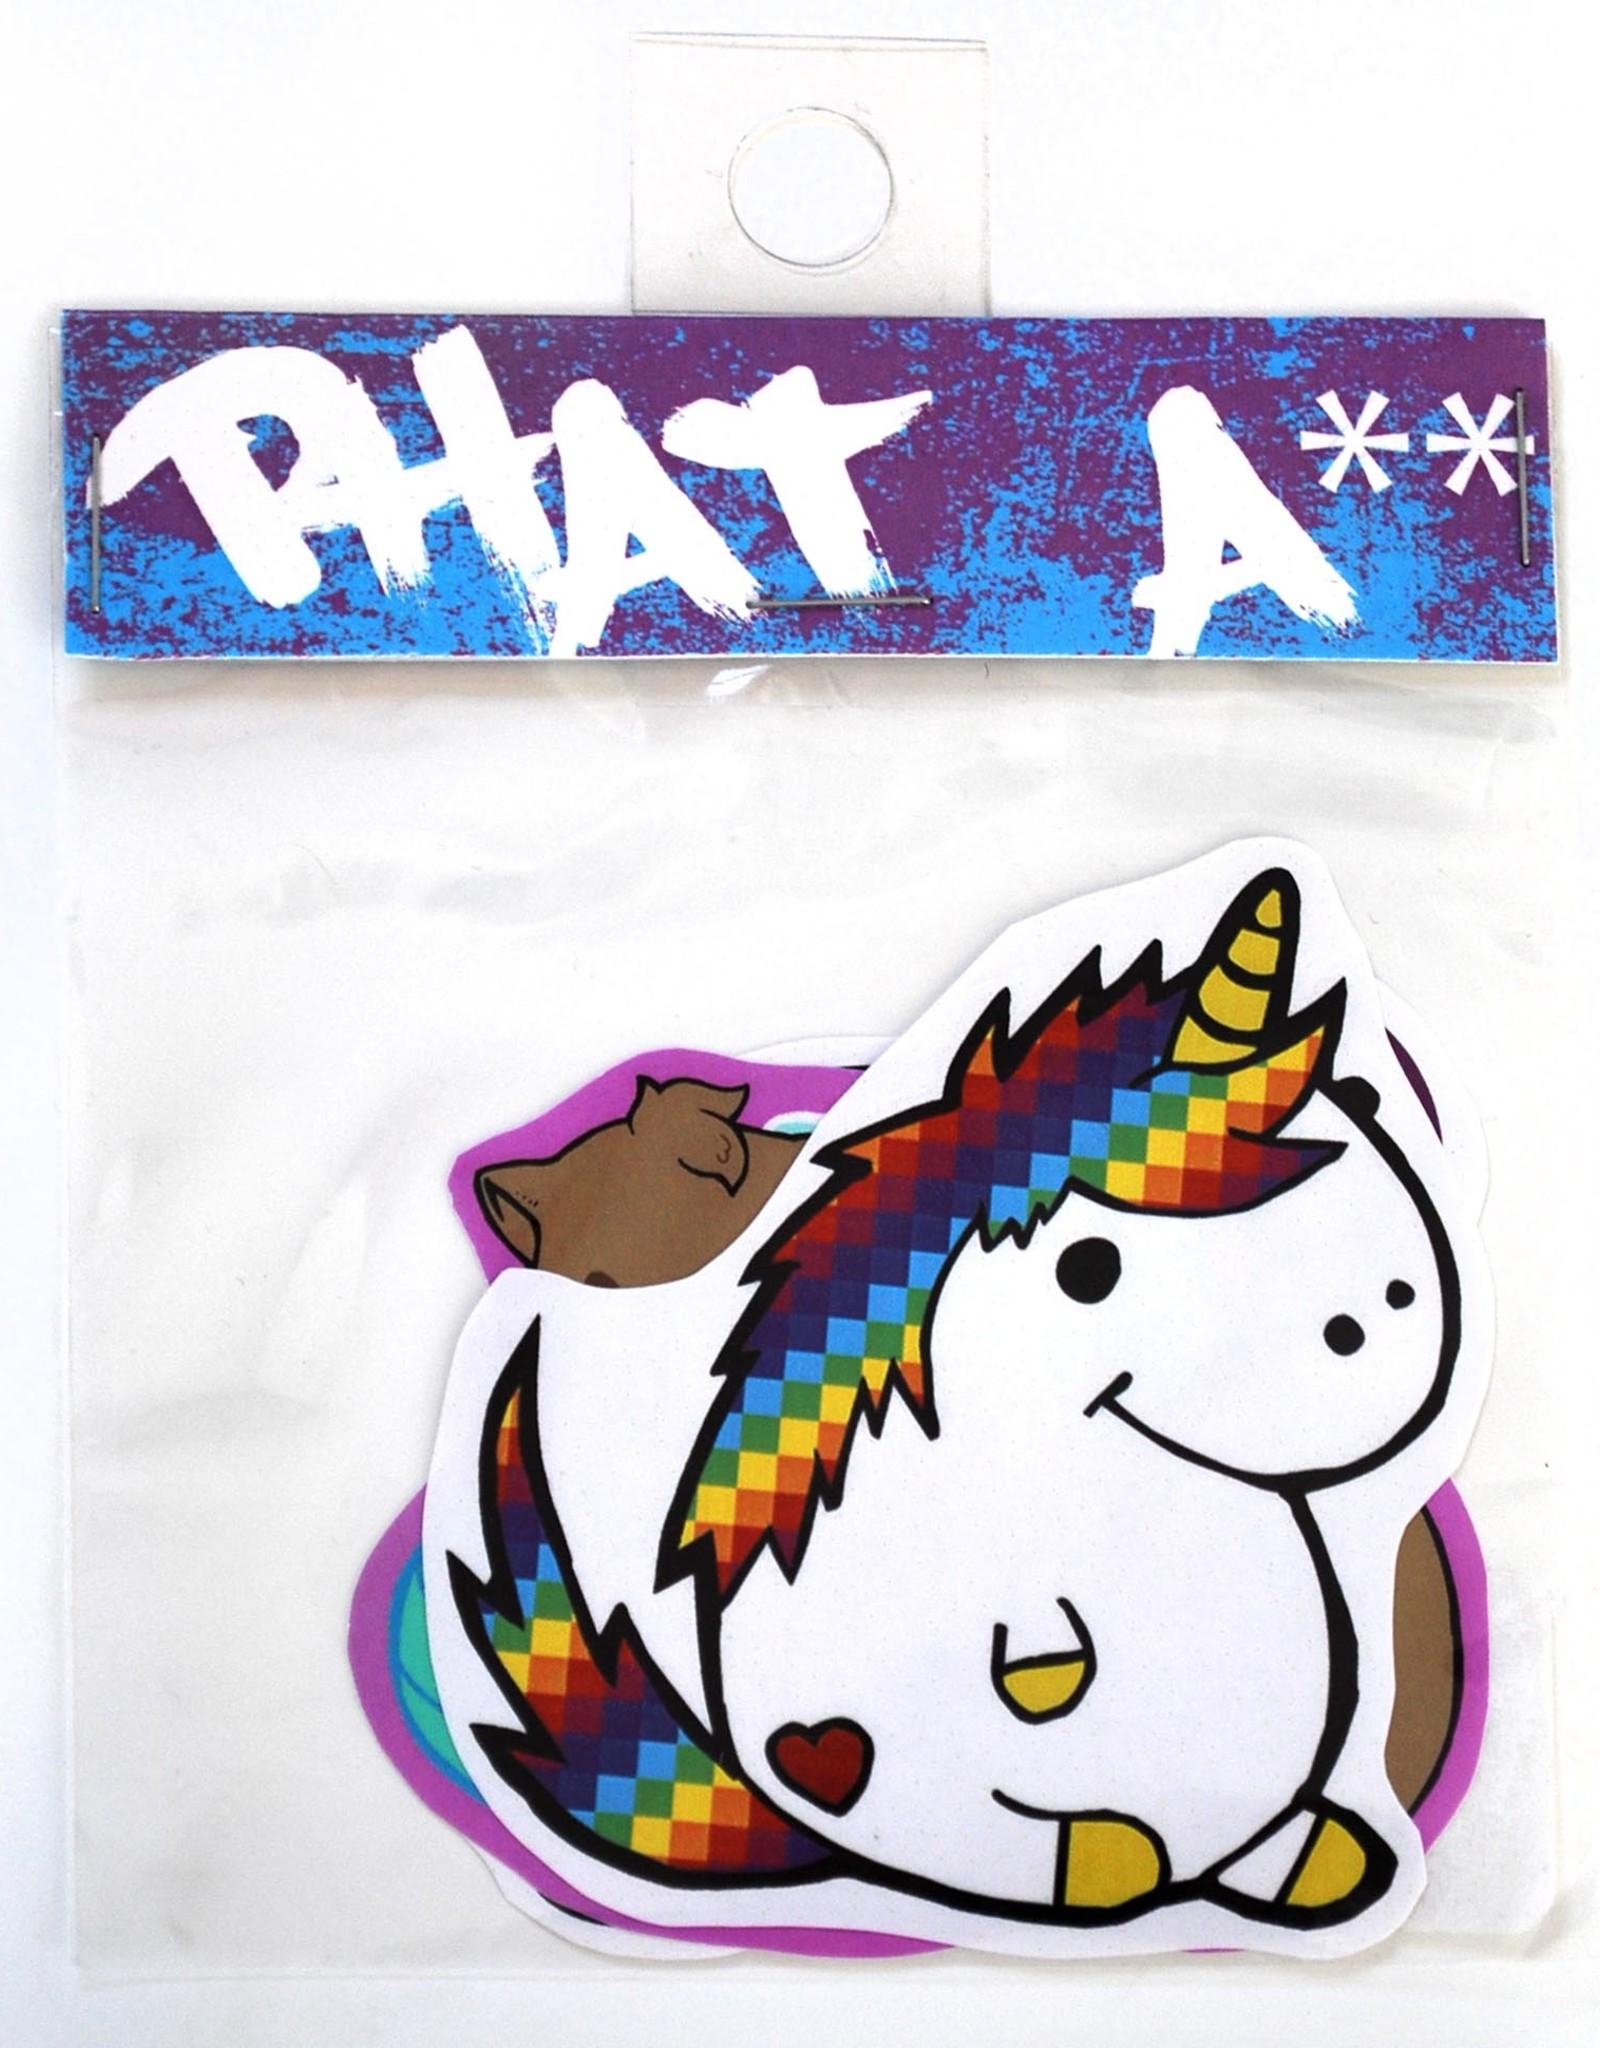 Knight Illustrations Phat Ass Sticker Bundle by David Knight